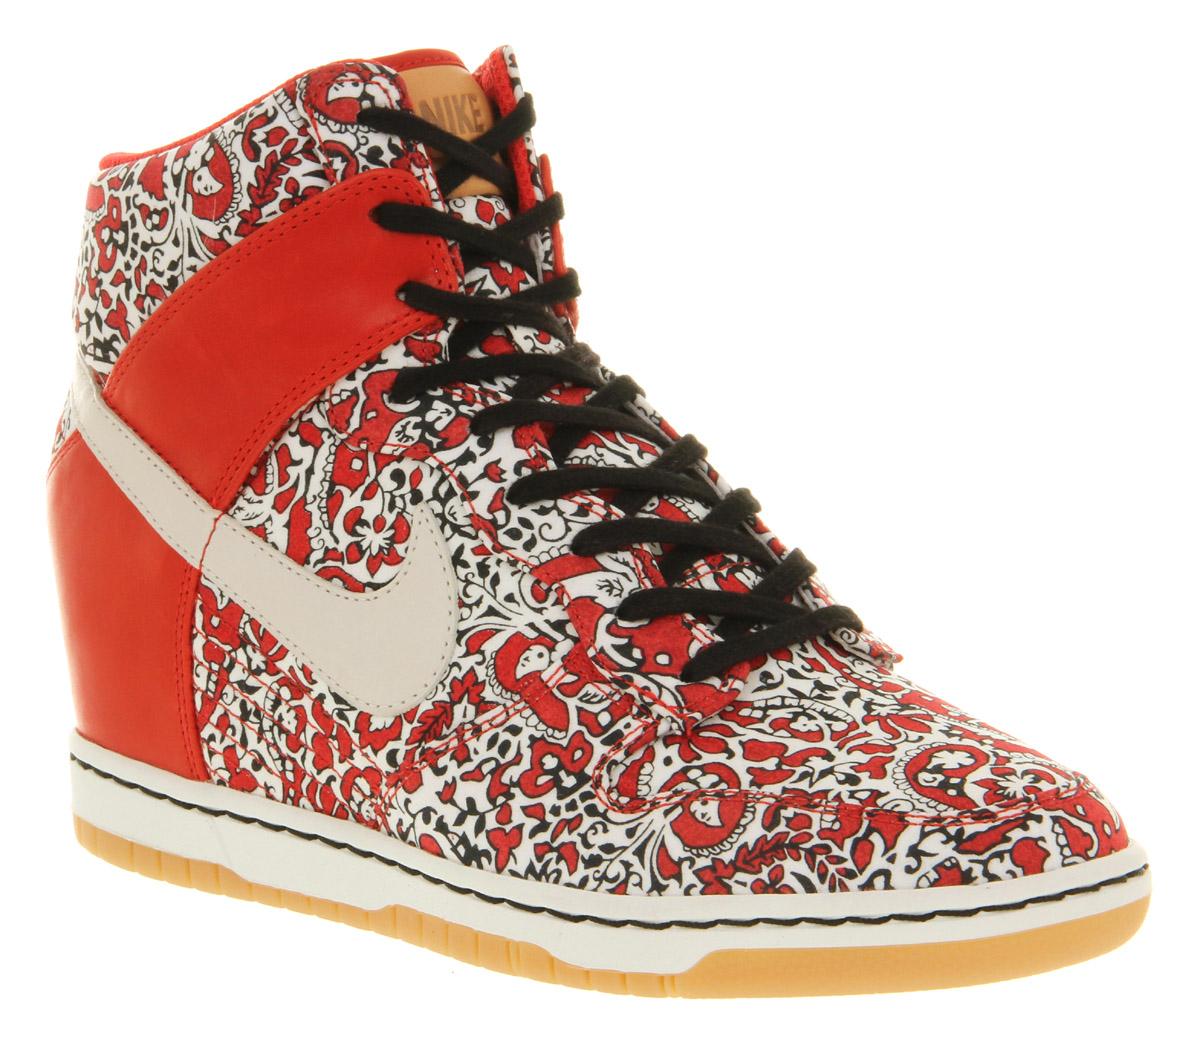 Nike Liberty Dunk, More Cute Shoes